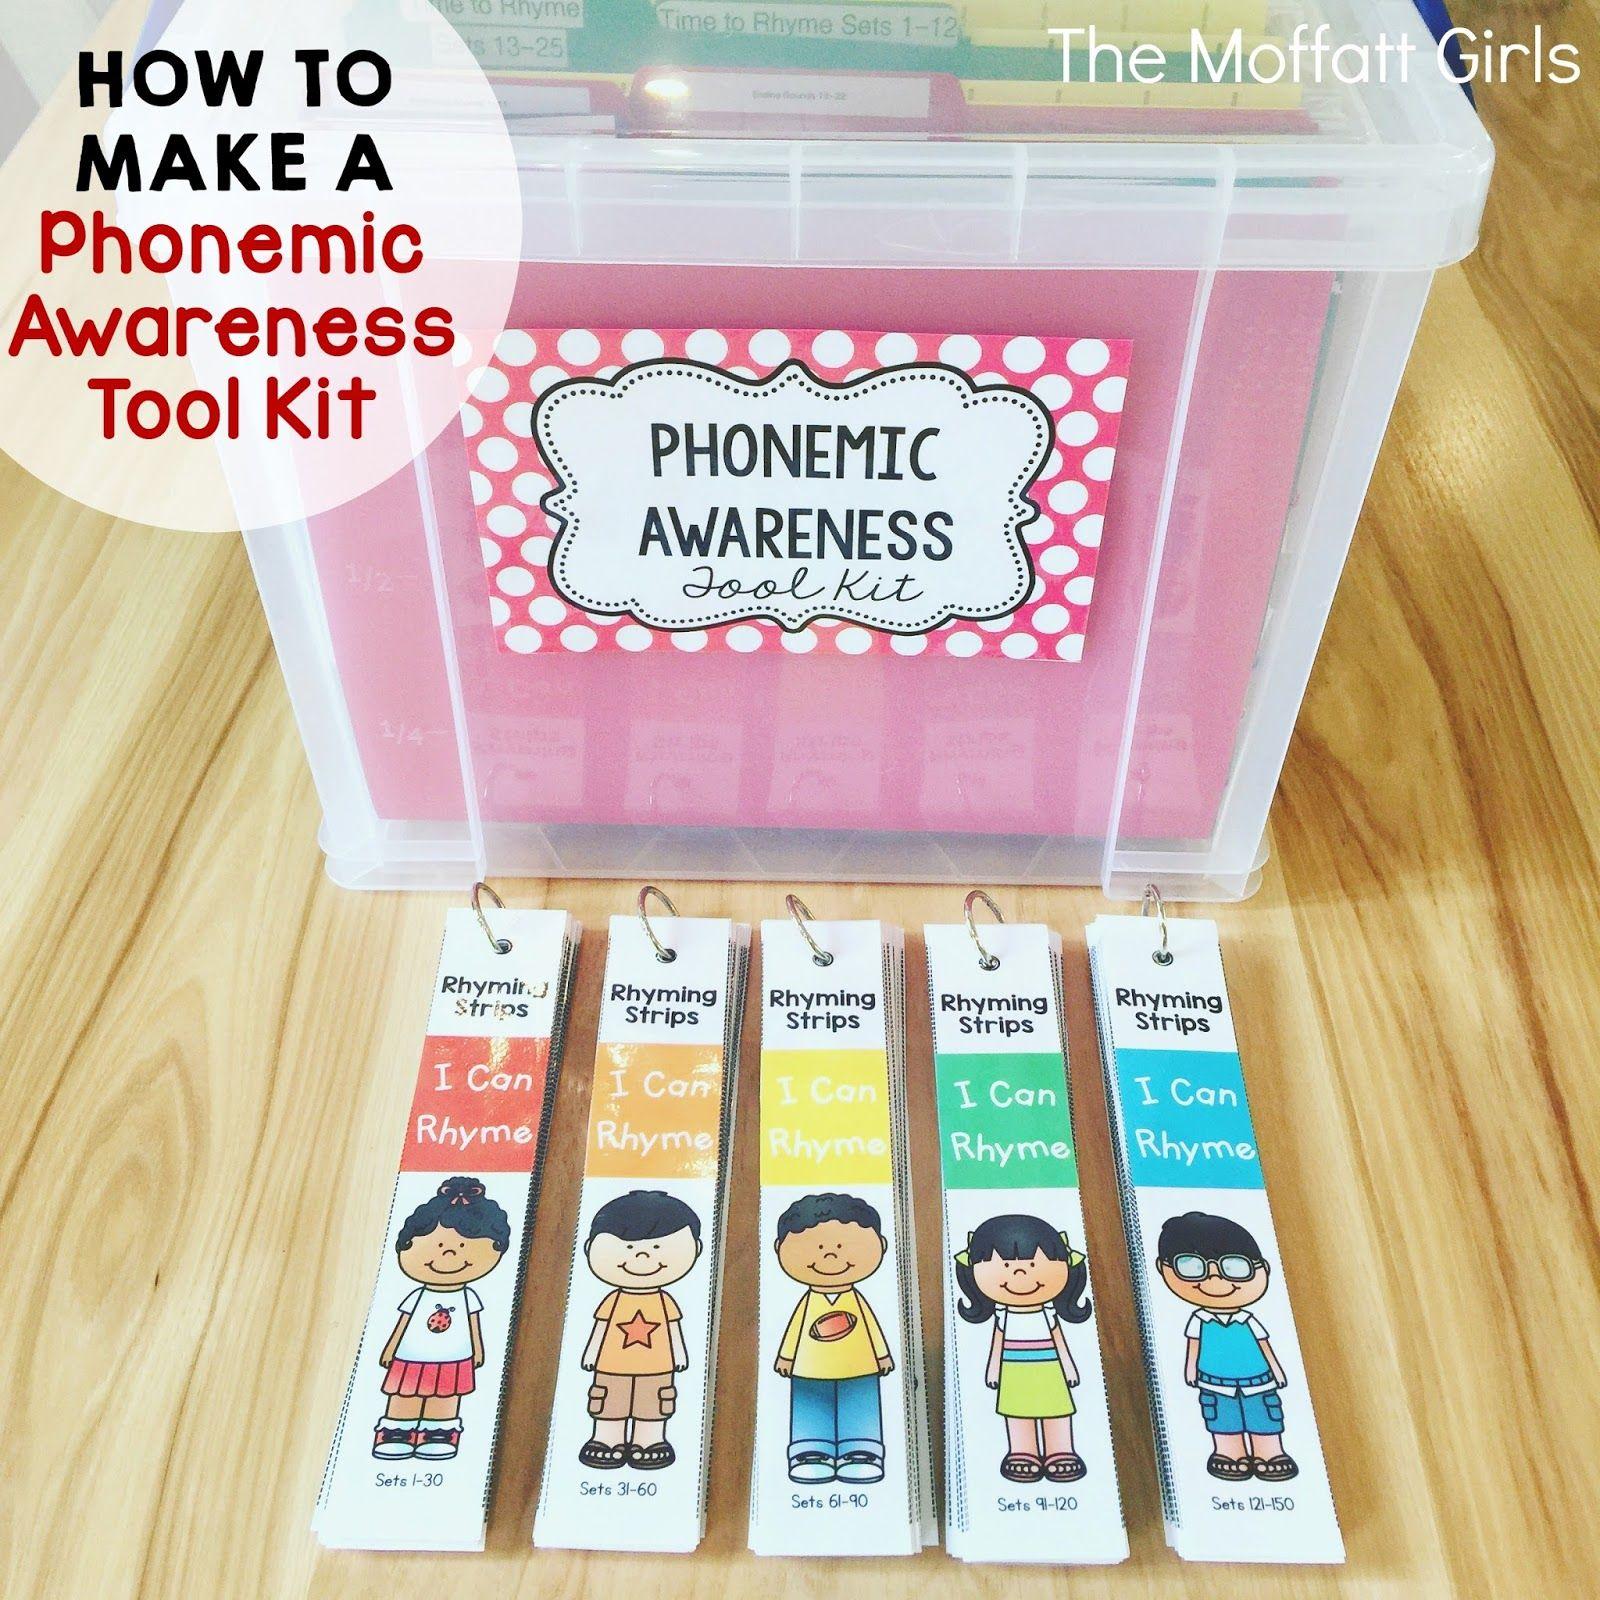 How To Make A Phonemic Awareness Tool Kit Keeping